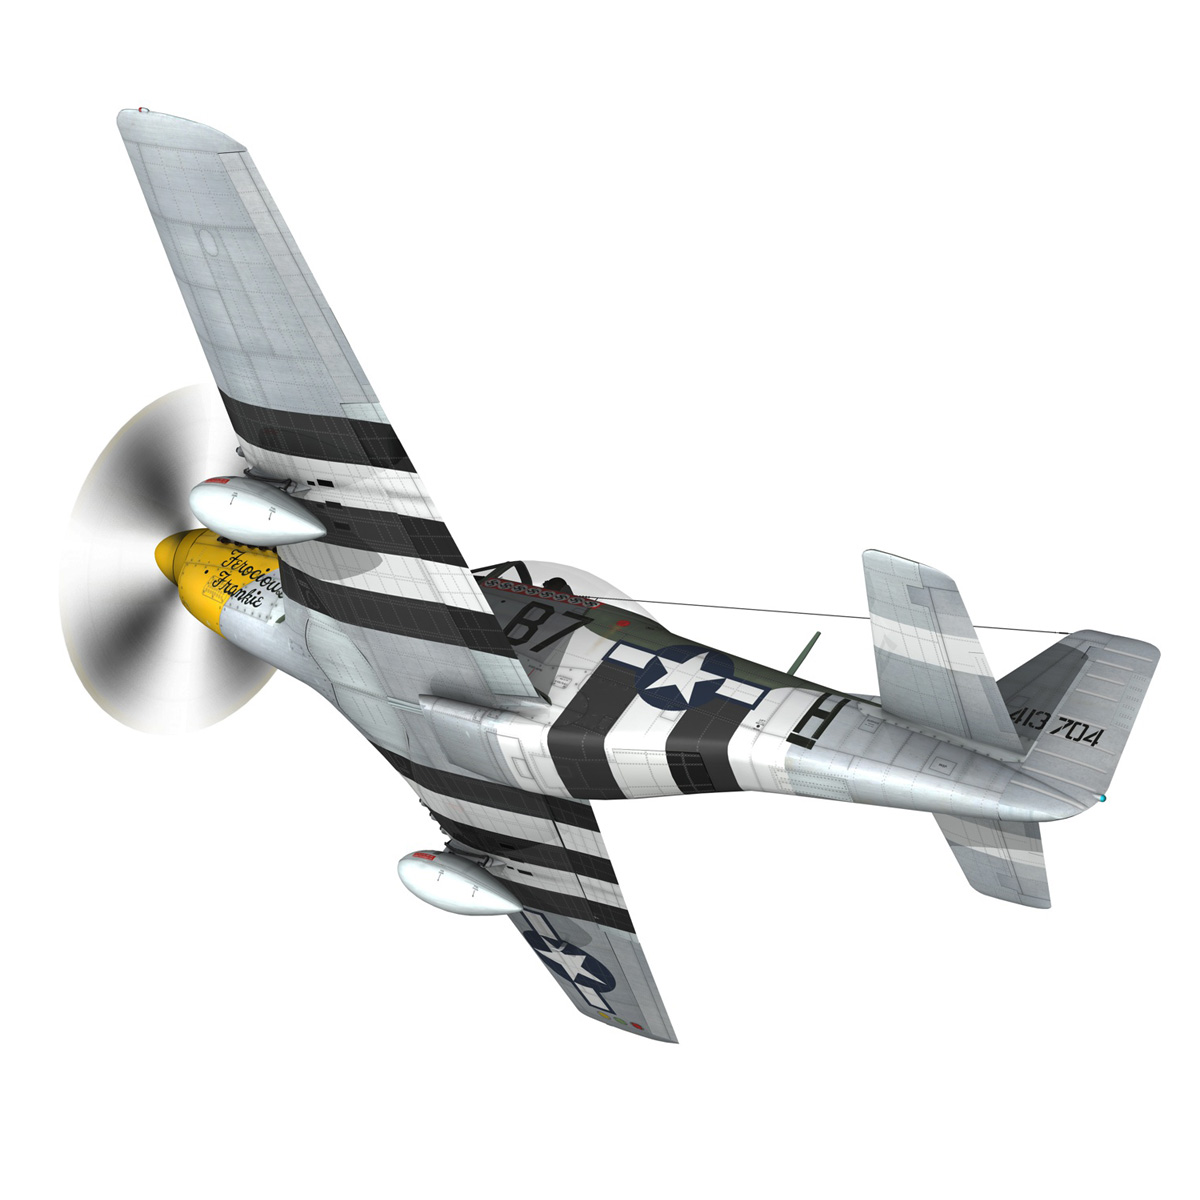 north american p-51d mustang – ferocious frankie 3d model fbx c4d lwo obj 269489